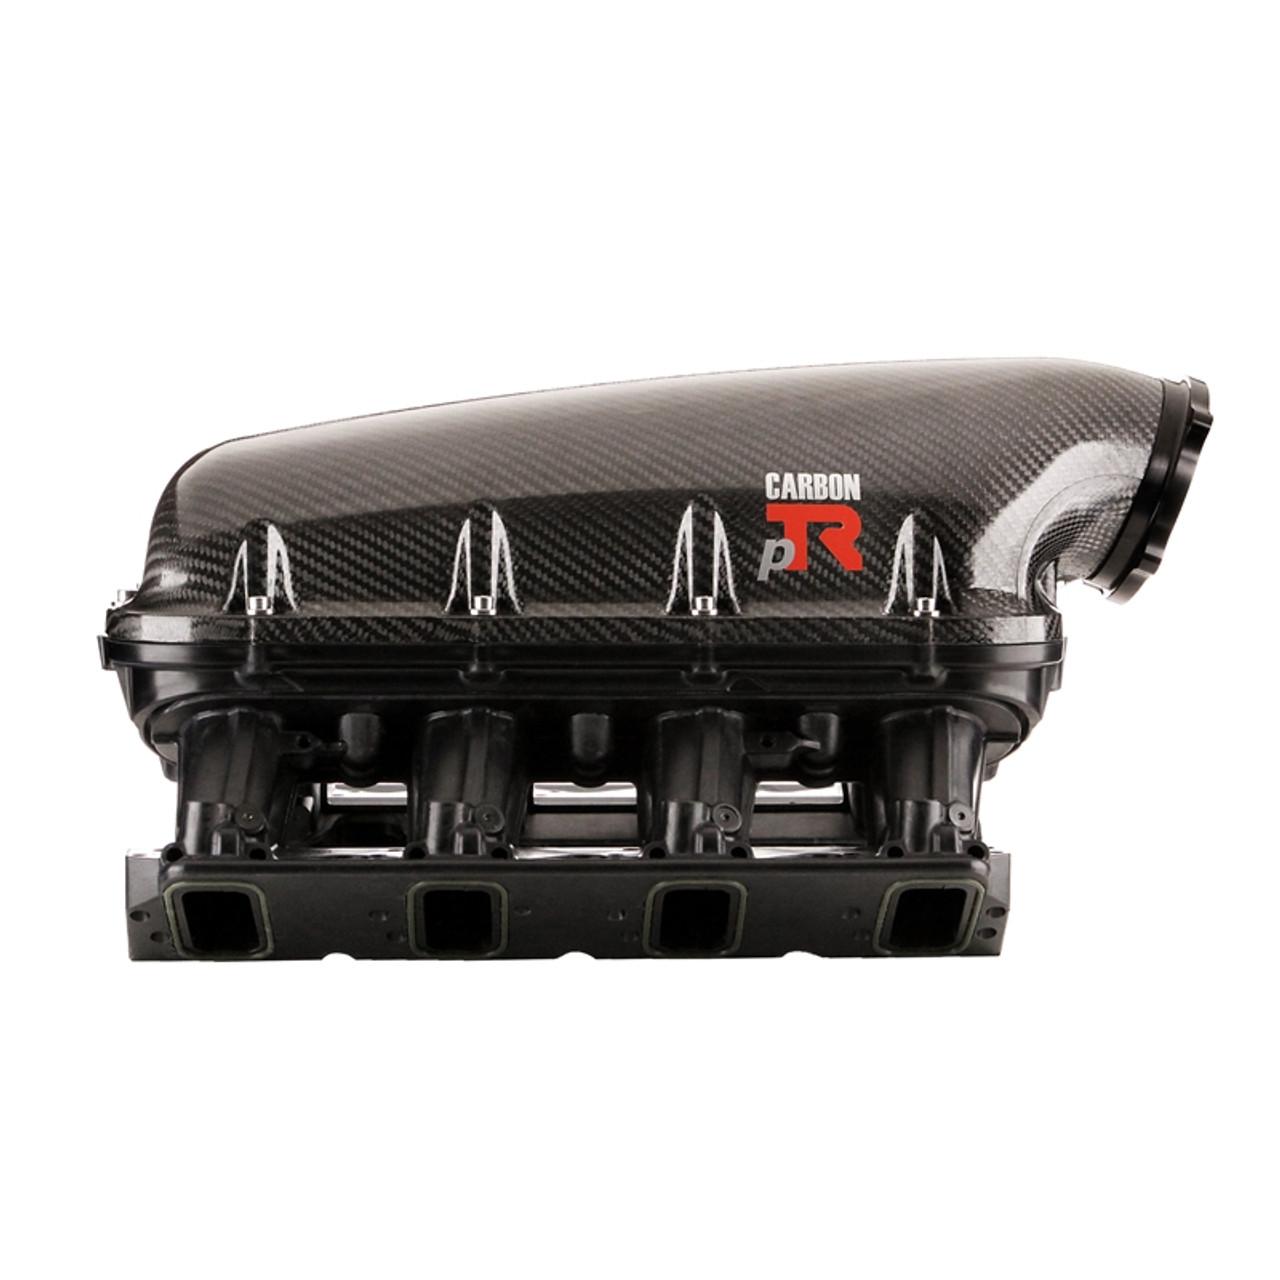 Performance Design Carbon pTR Intake Manifold | LS7 Port